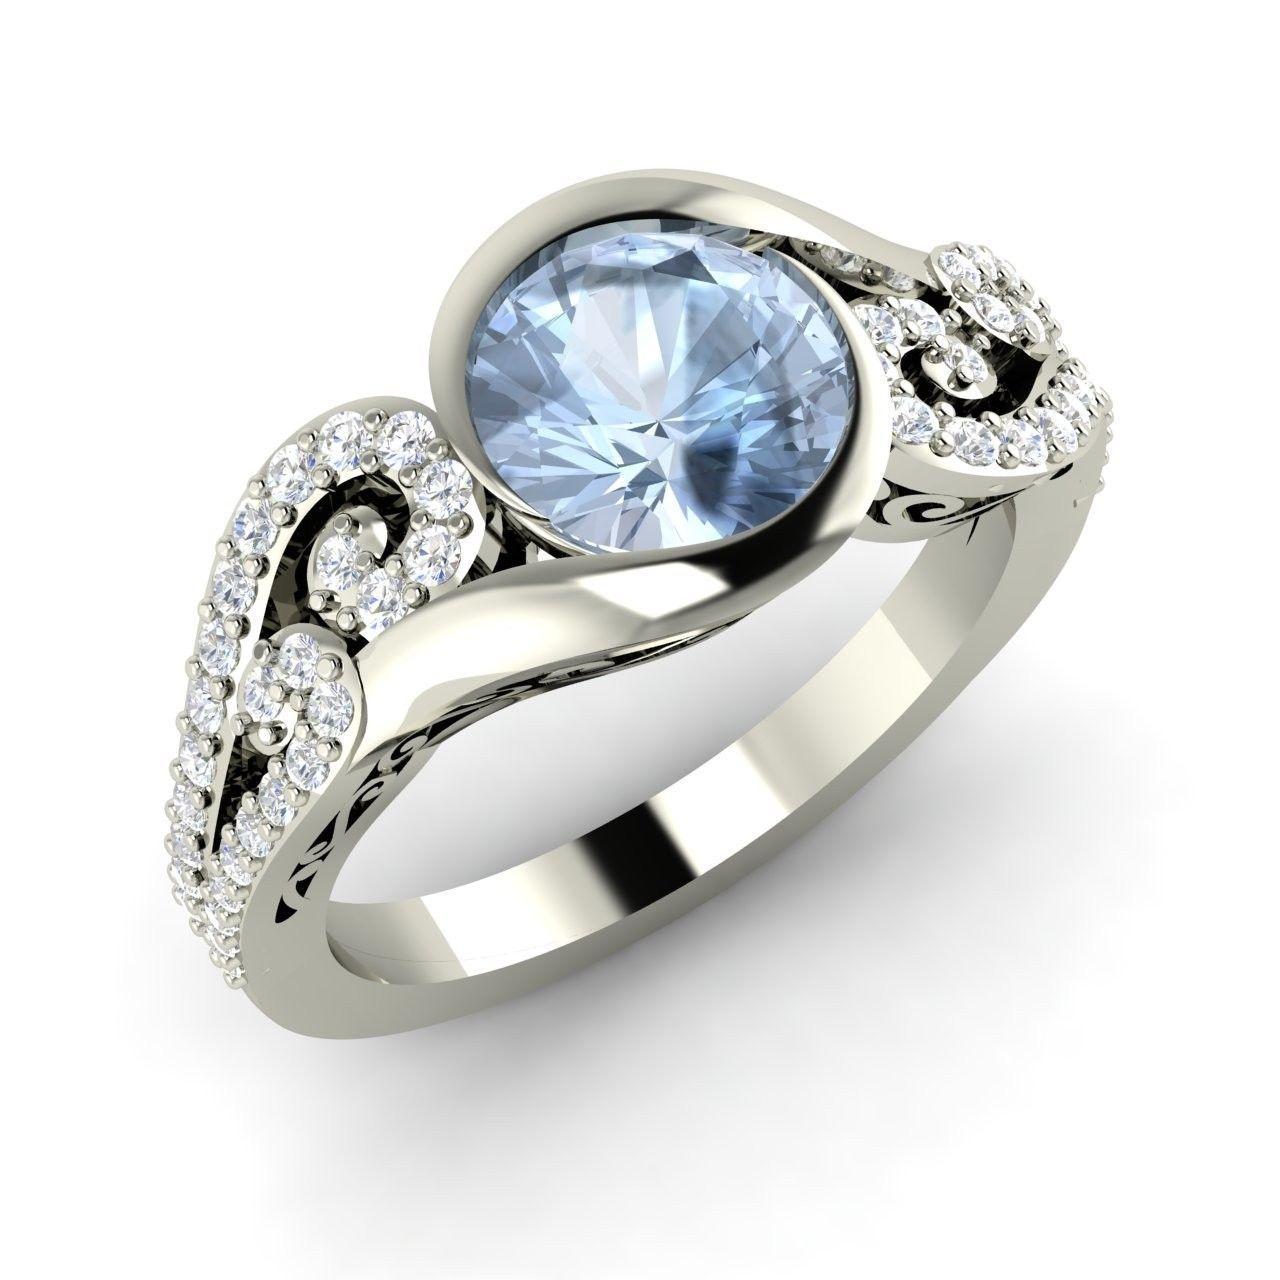 1 24 Ct Natural Aquamarine Engagement 14k White Gold Ring Inspired